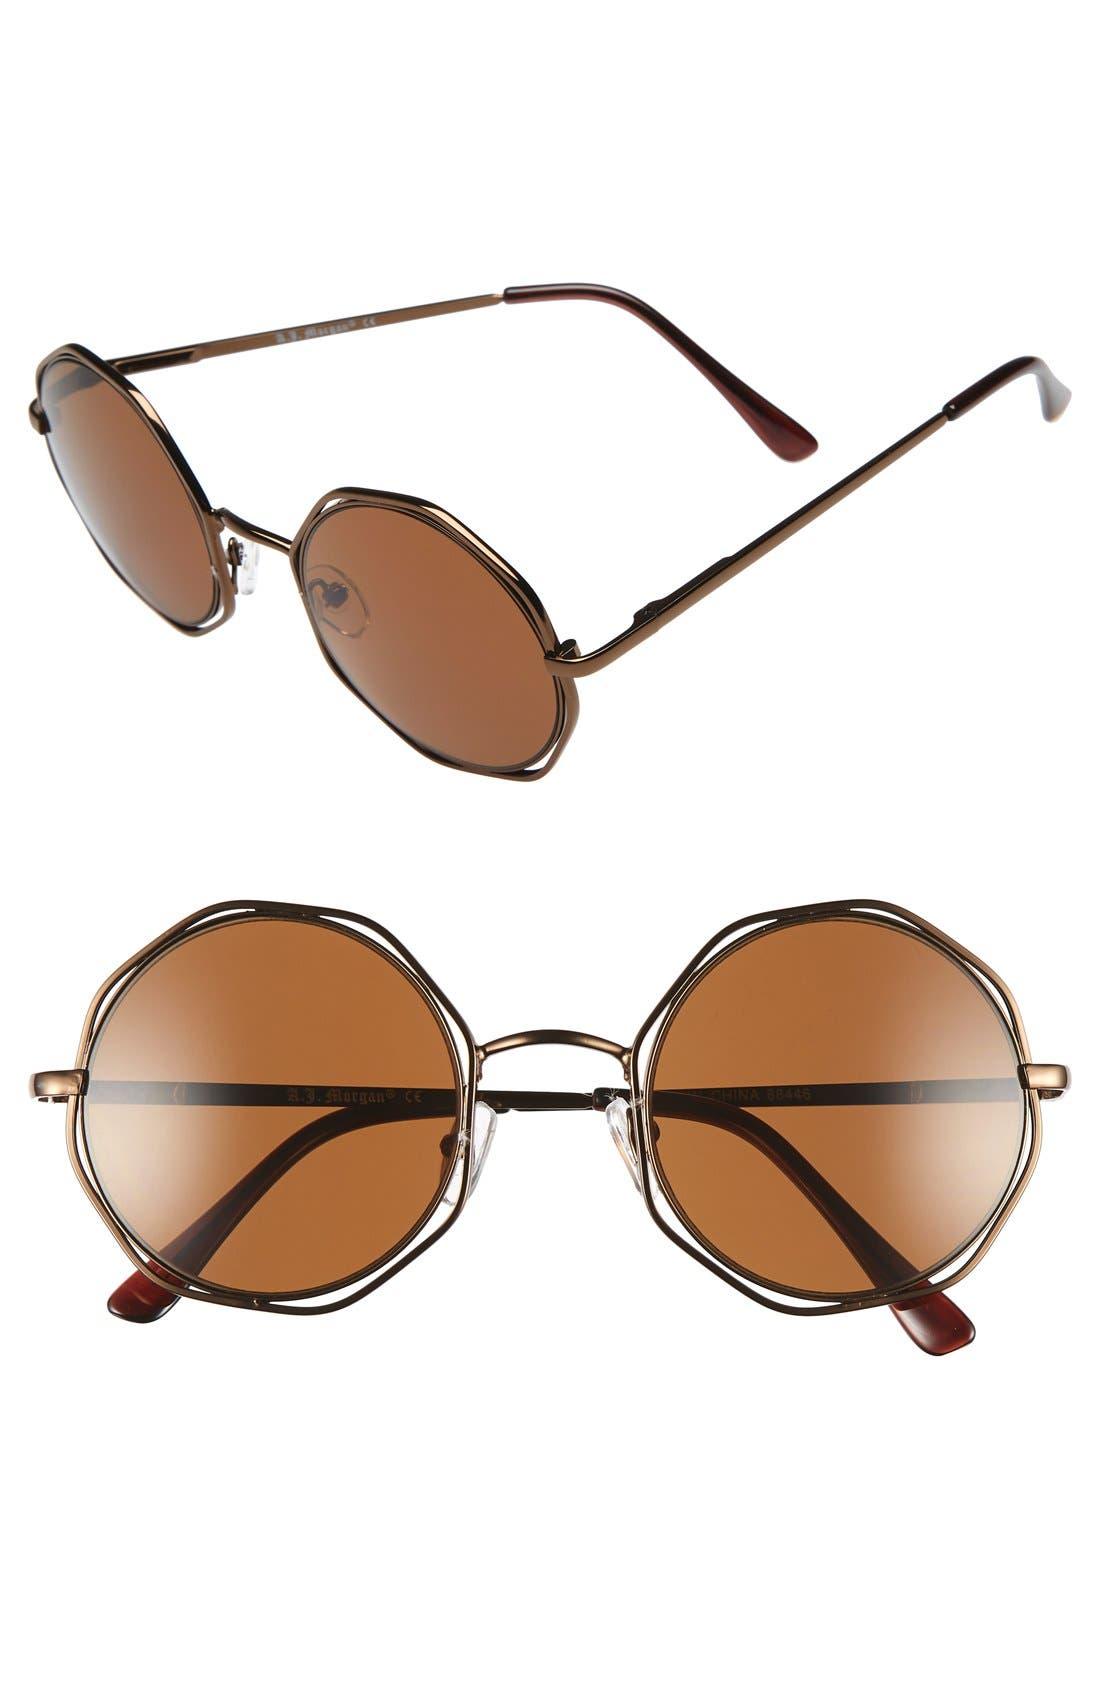 A.J. MORGAN 'Clayton' 48mm Octagon Wire Sunglasses, Main, color, 220